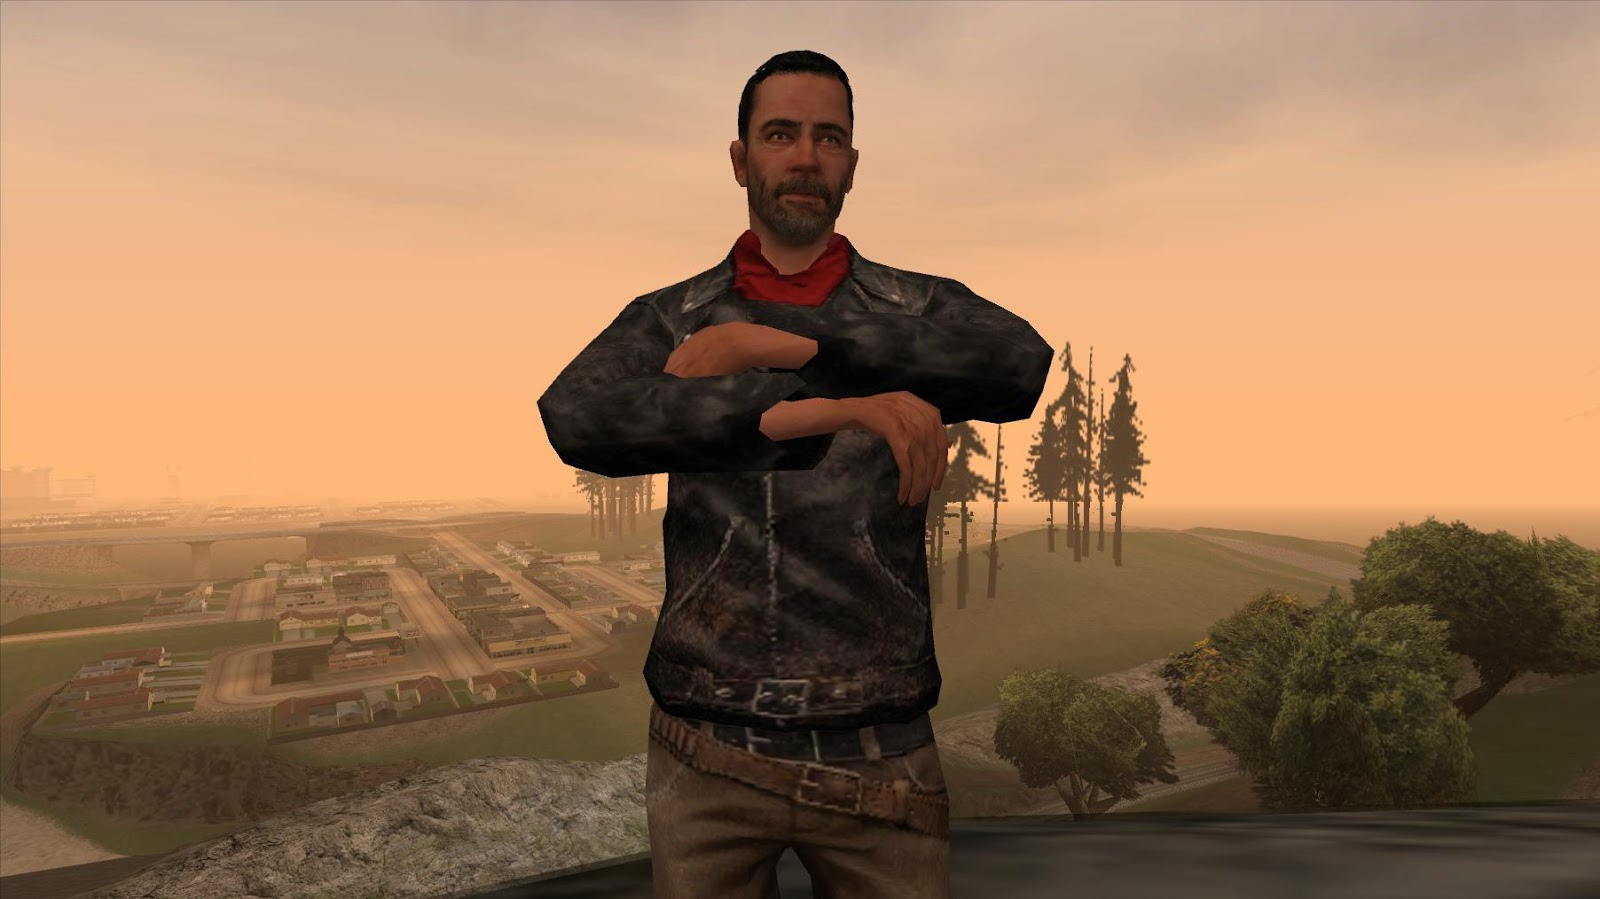 Solidcal Modding: [REL-GTA SA] The Walking Dead No Man's Land Negan